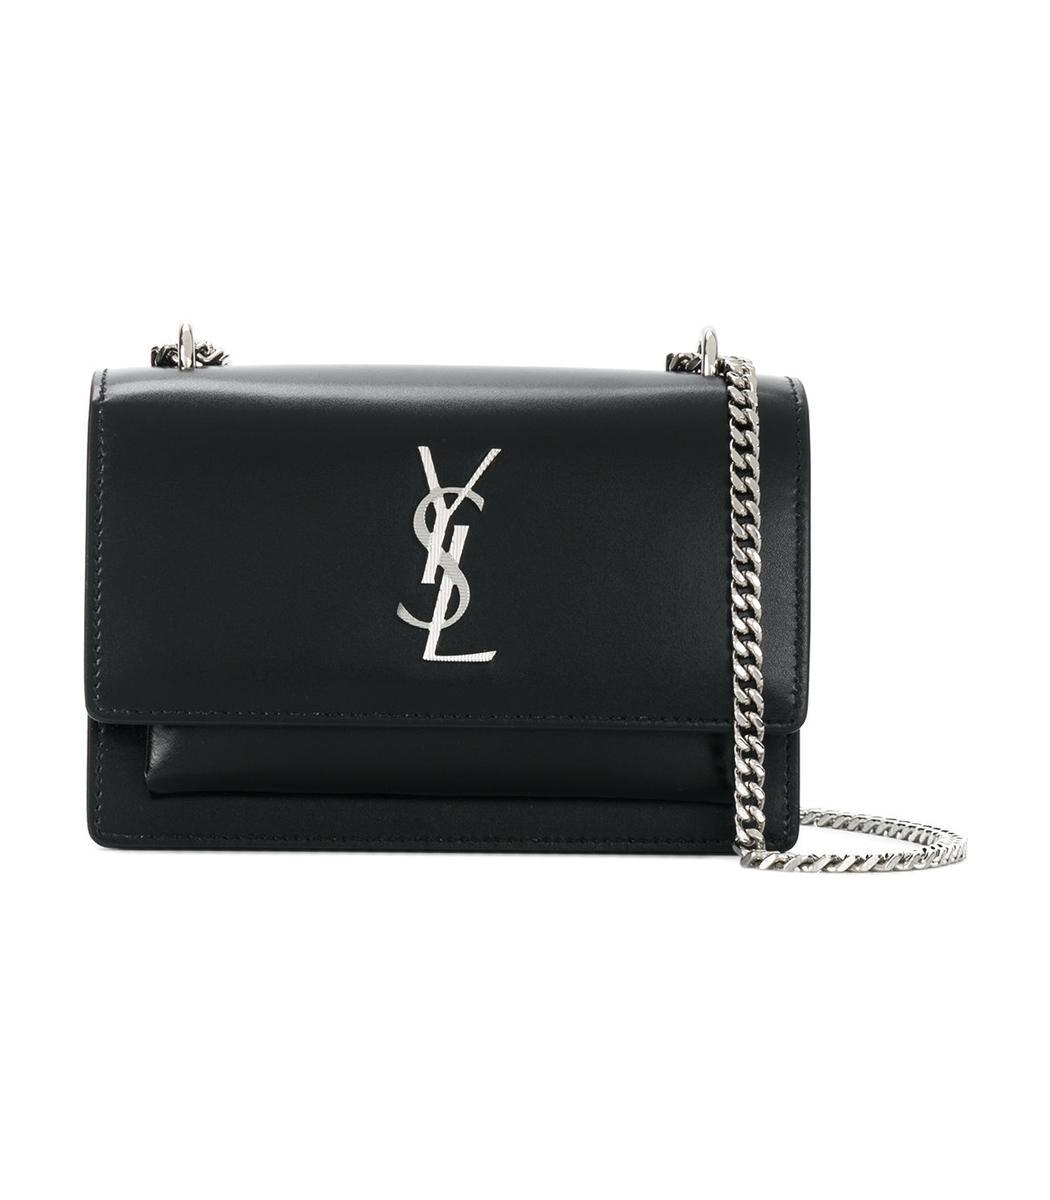 Saint Laurent Mini Sunset Chain Wallet Bag In Black